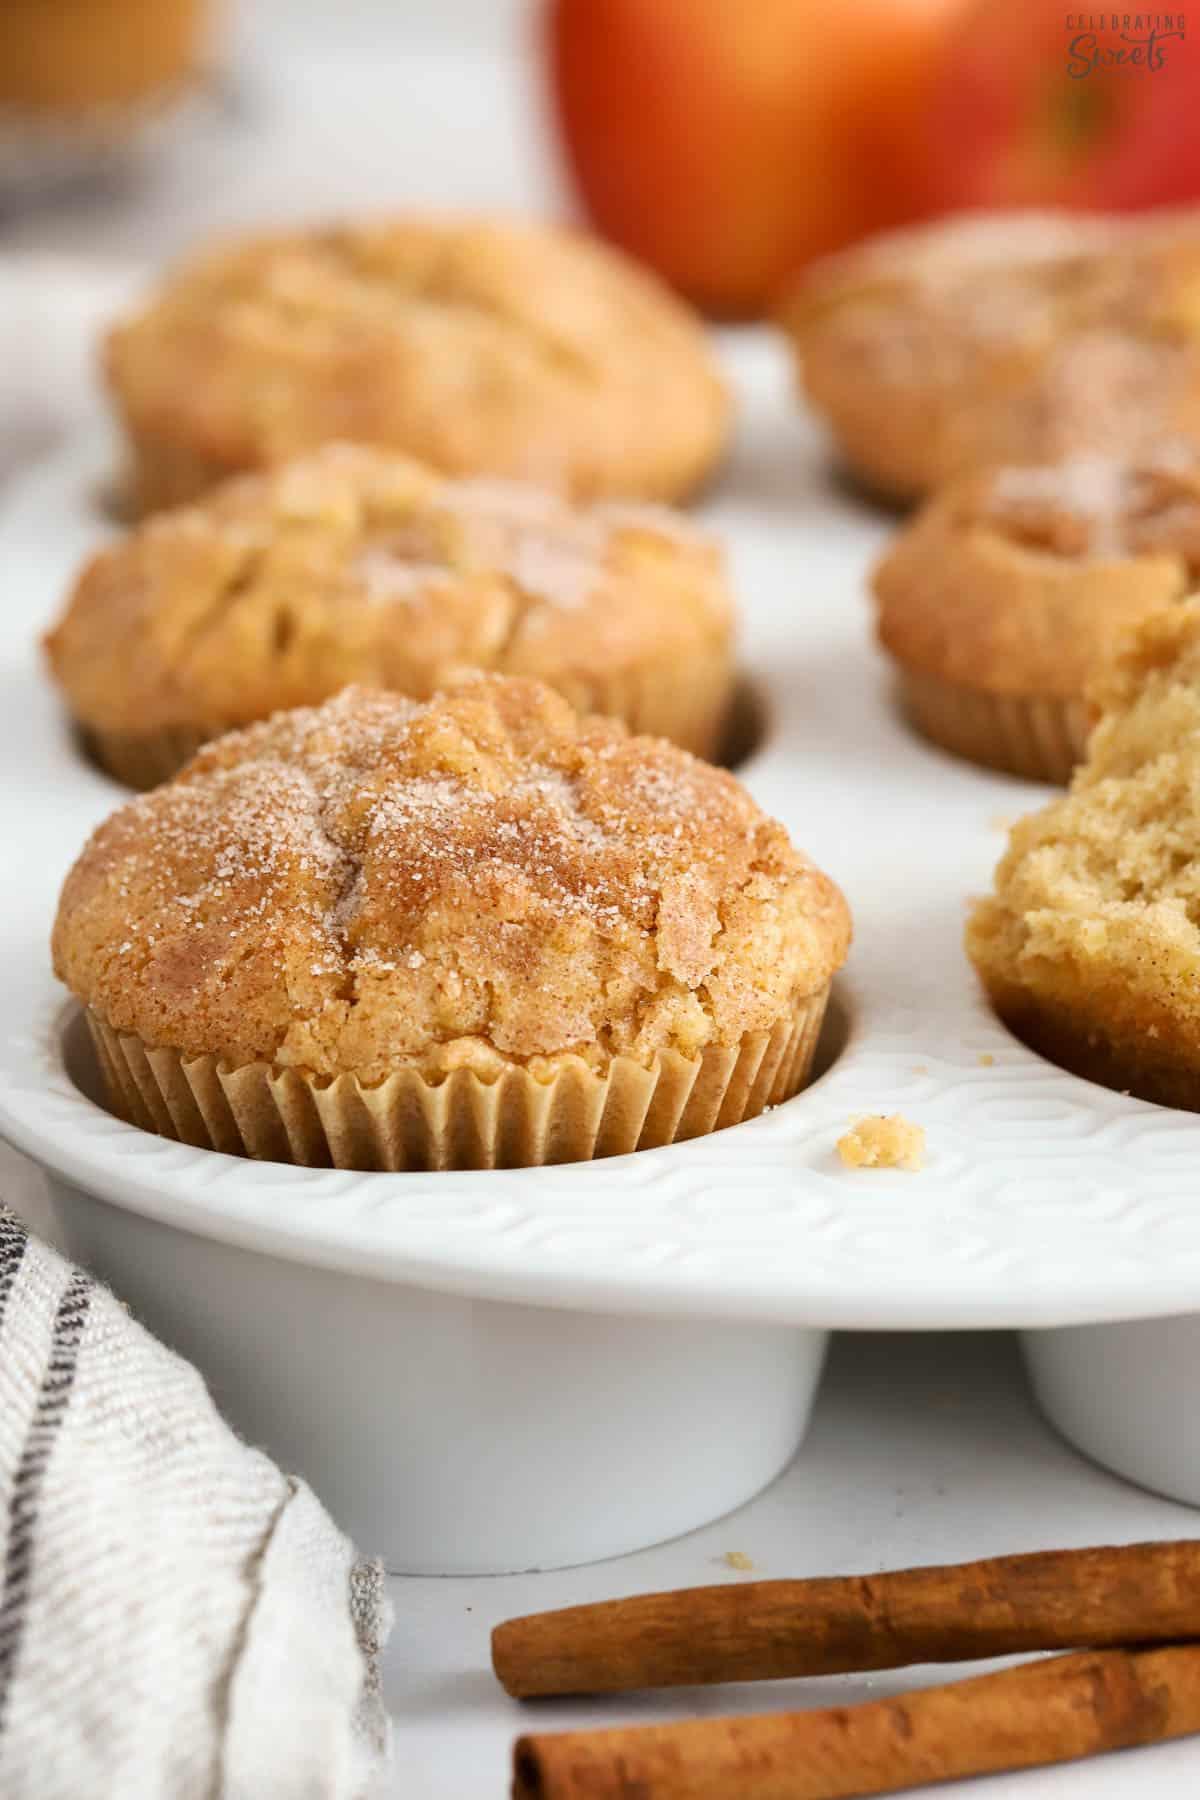 Apple cinnamon muffins in a white muffin baking dish.